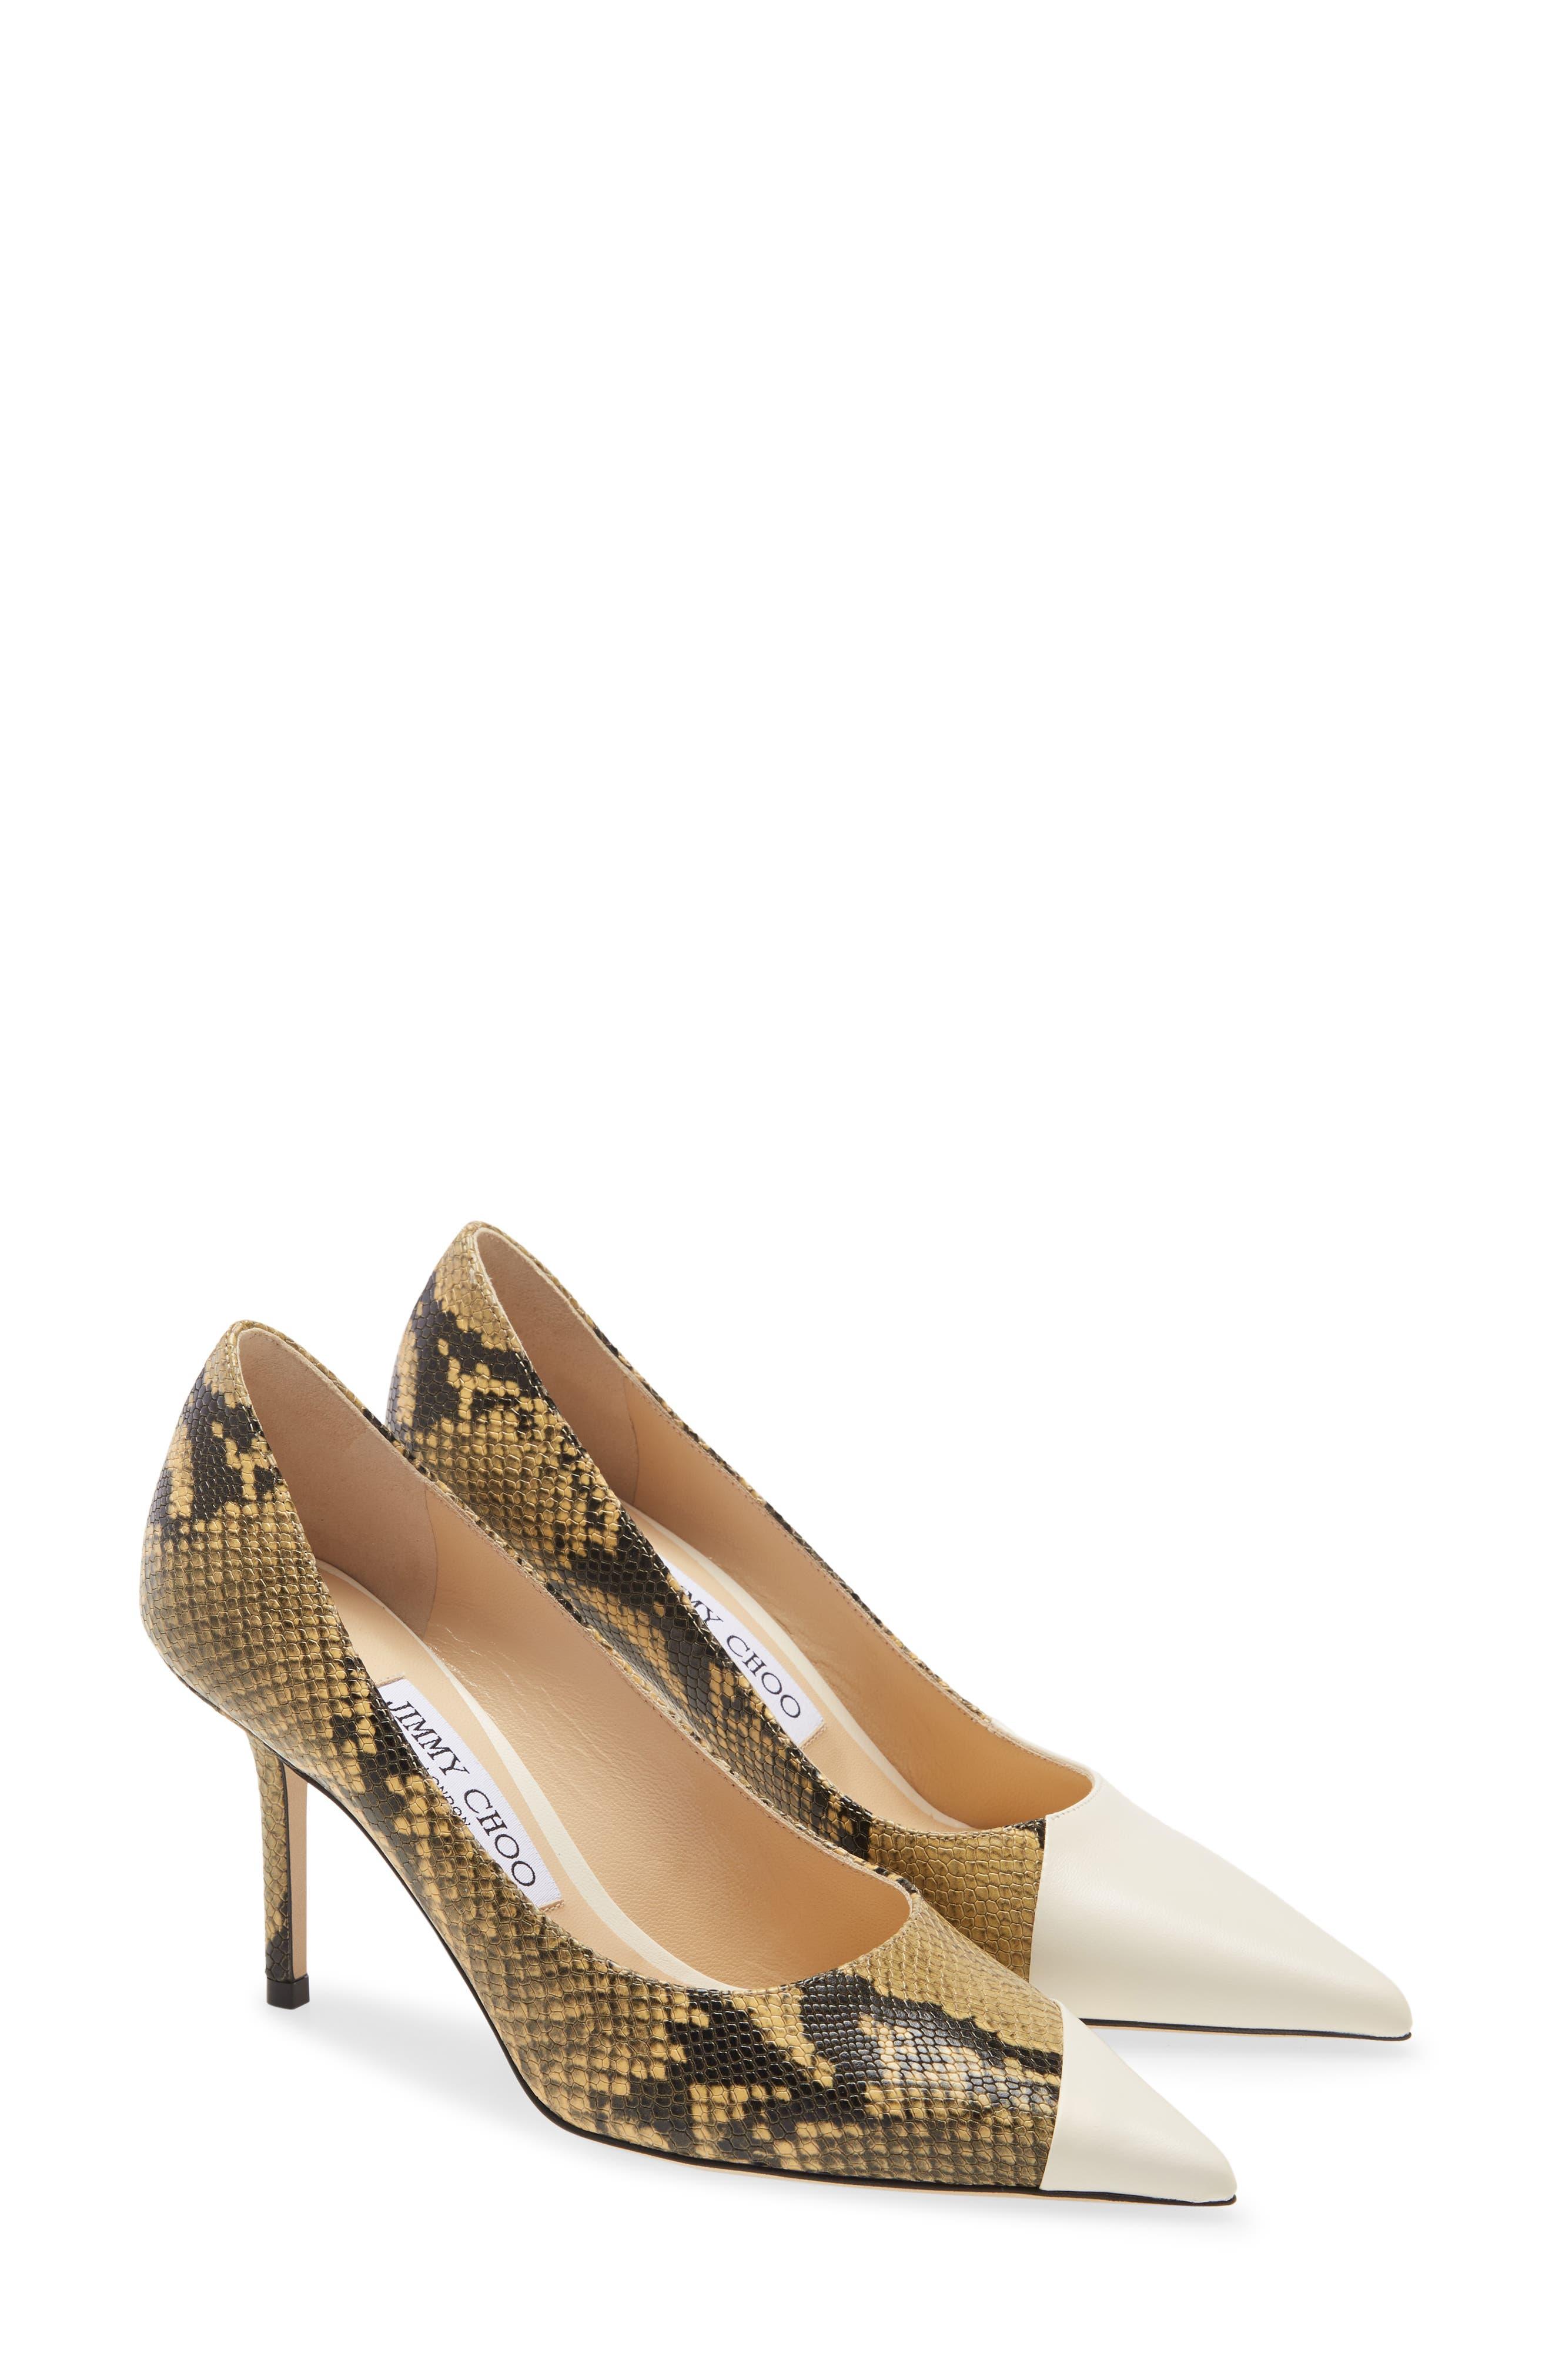 Women's Jimmy Choo Shoes   Nordstrom